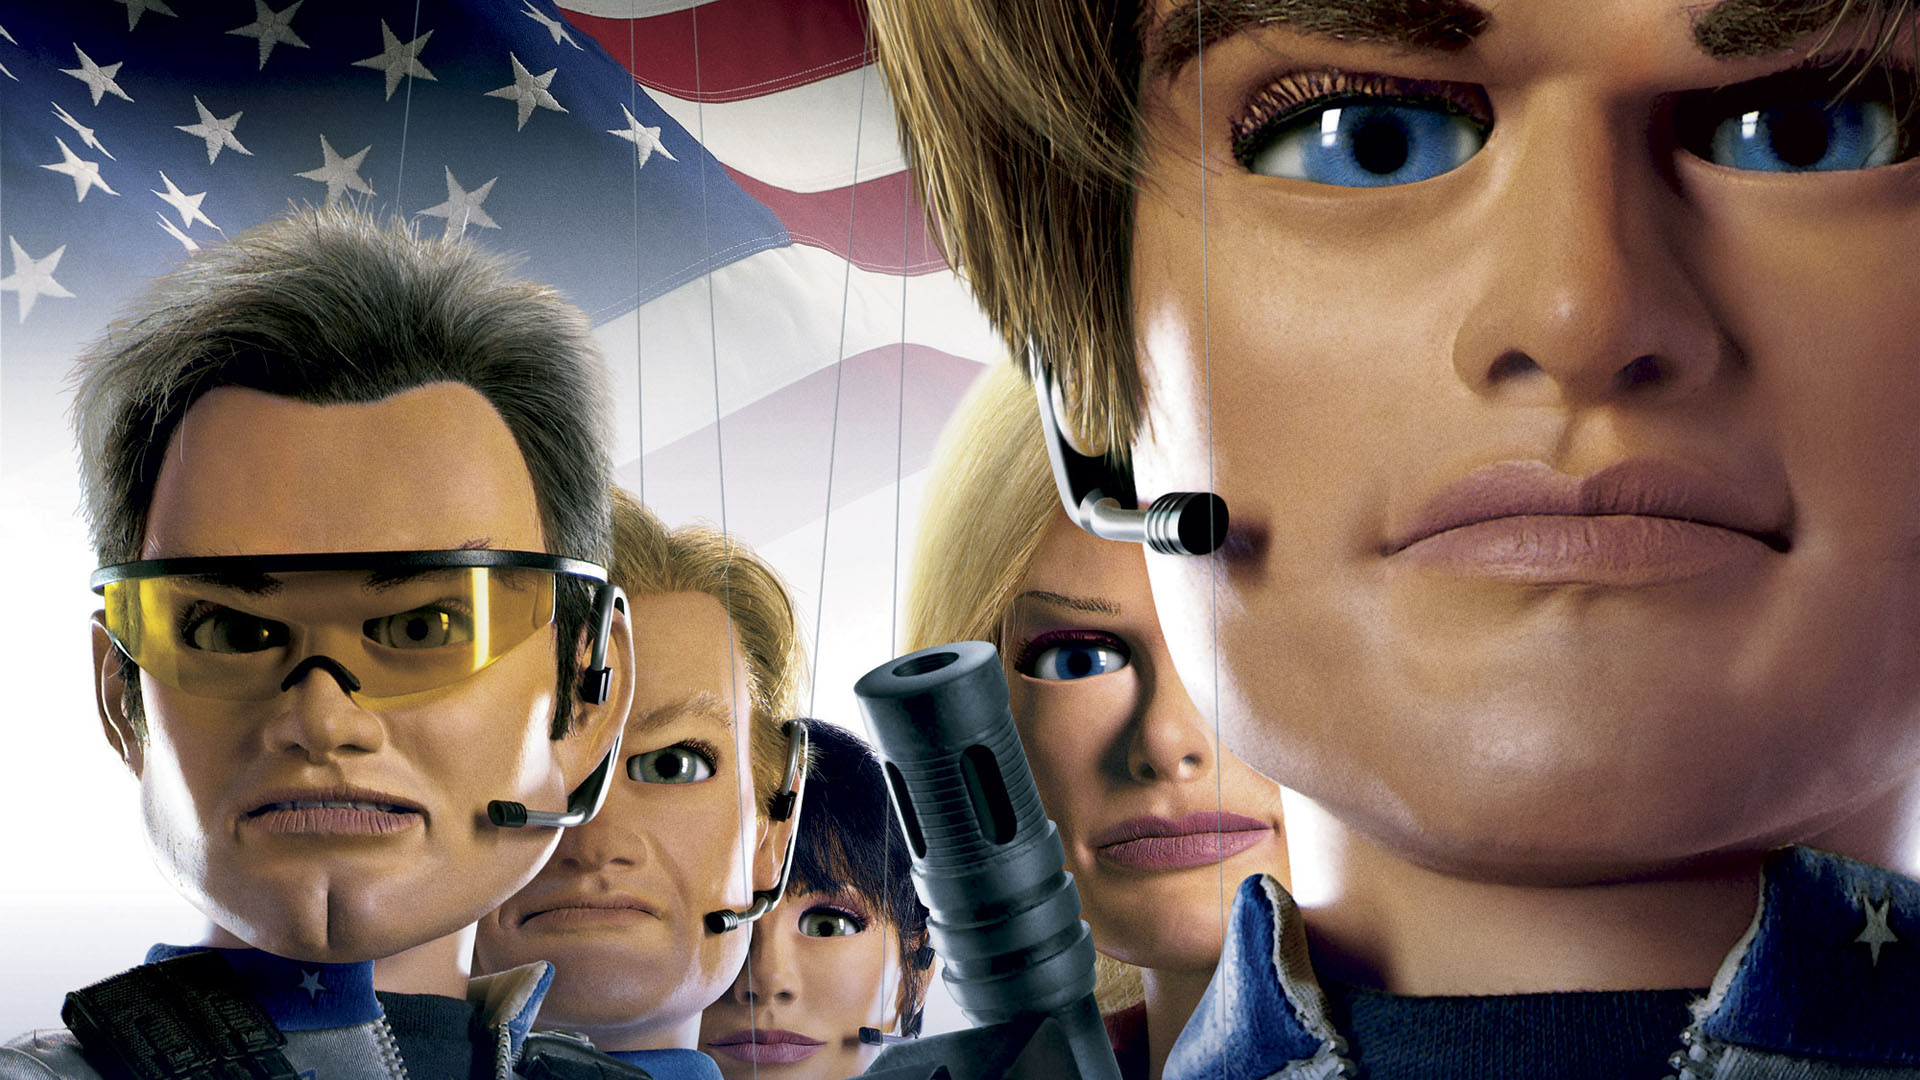 Team America World Police Memes